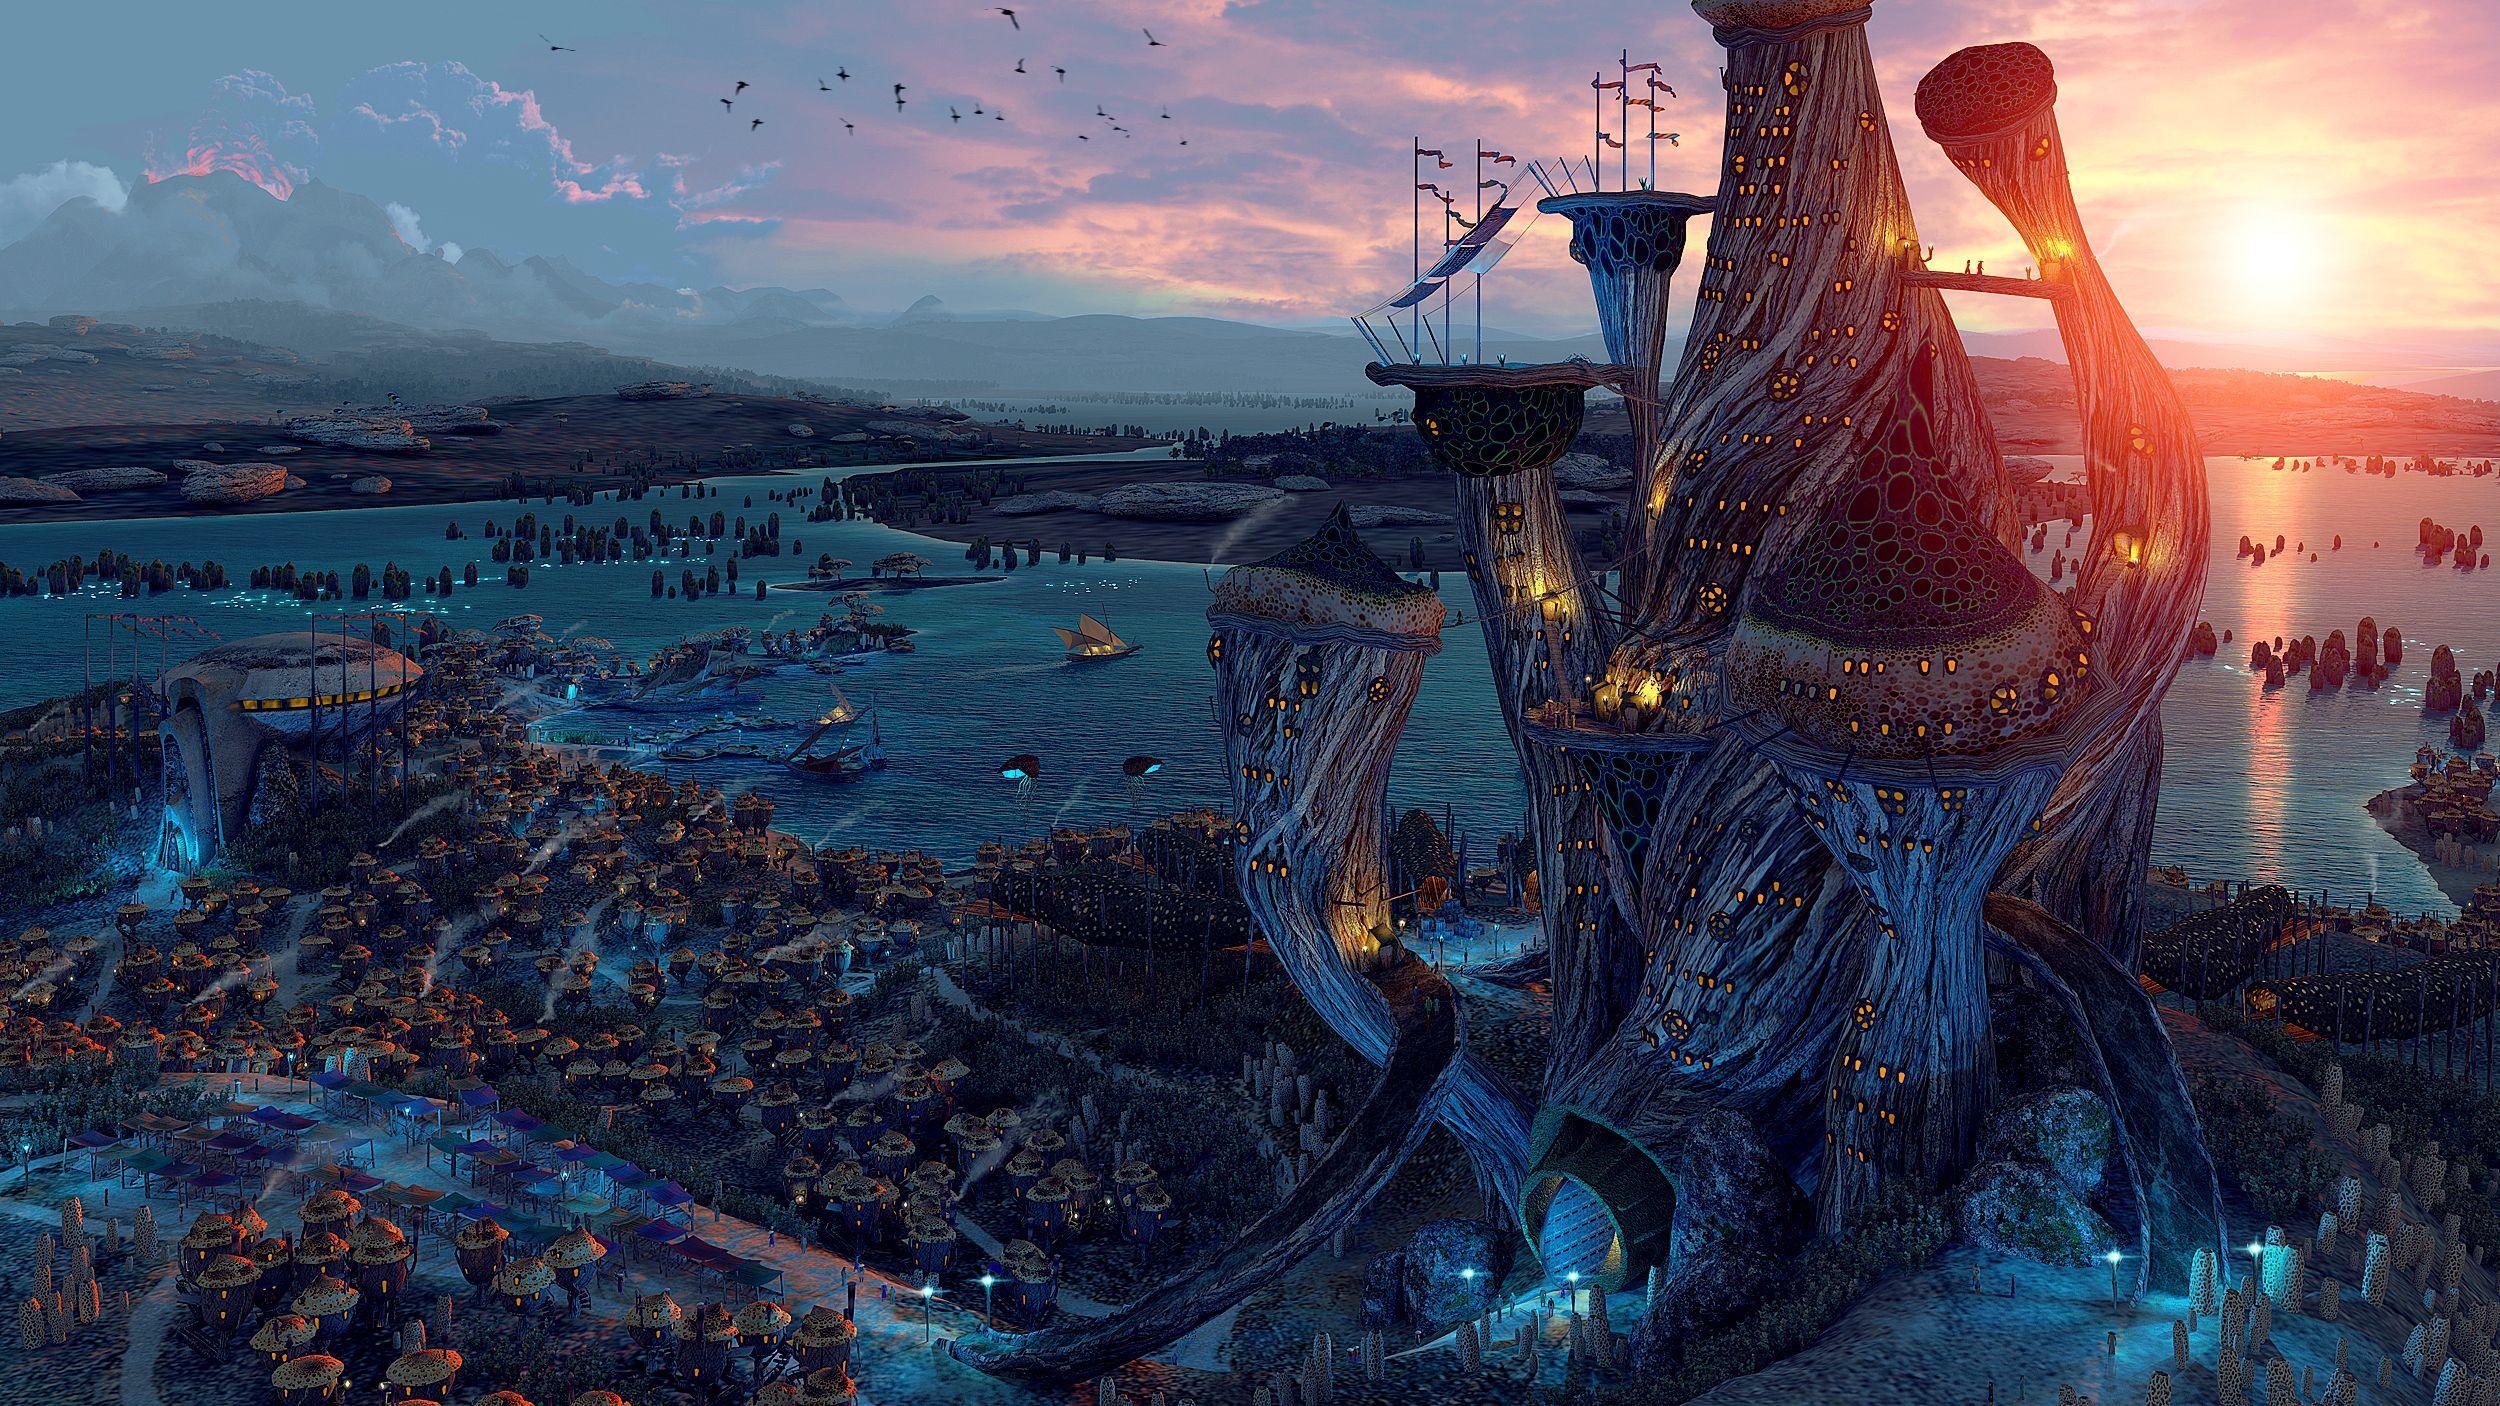 Morrowind Wallpapers Hd Wallpaper Cave